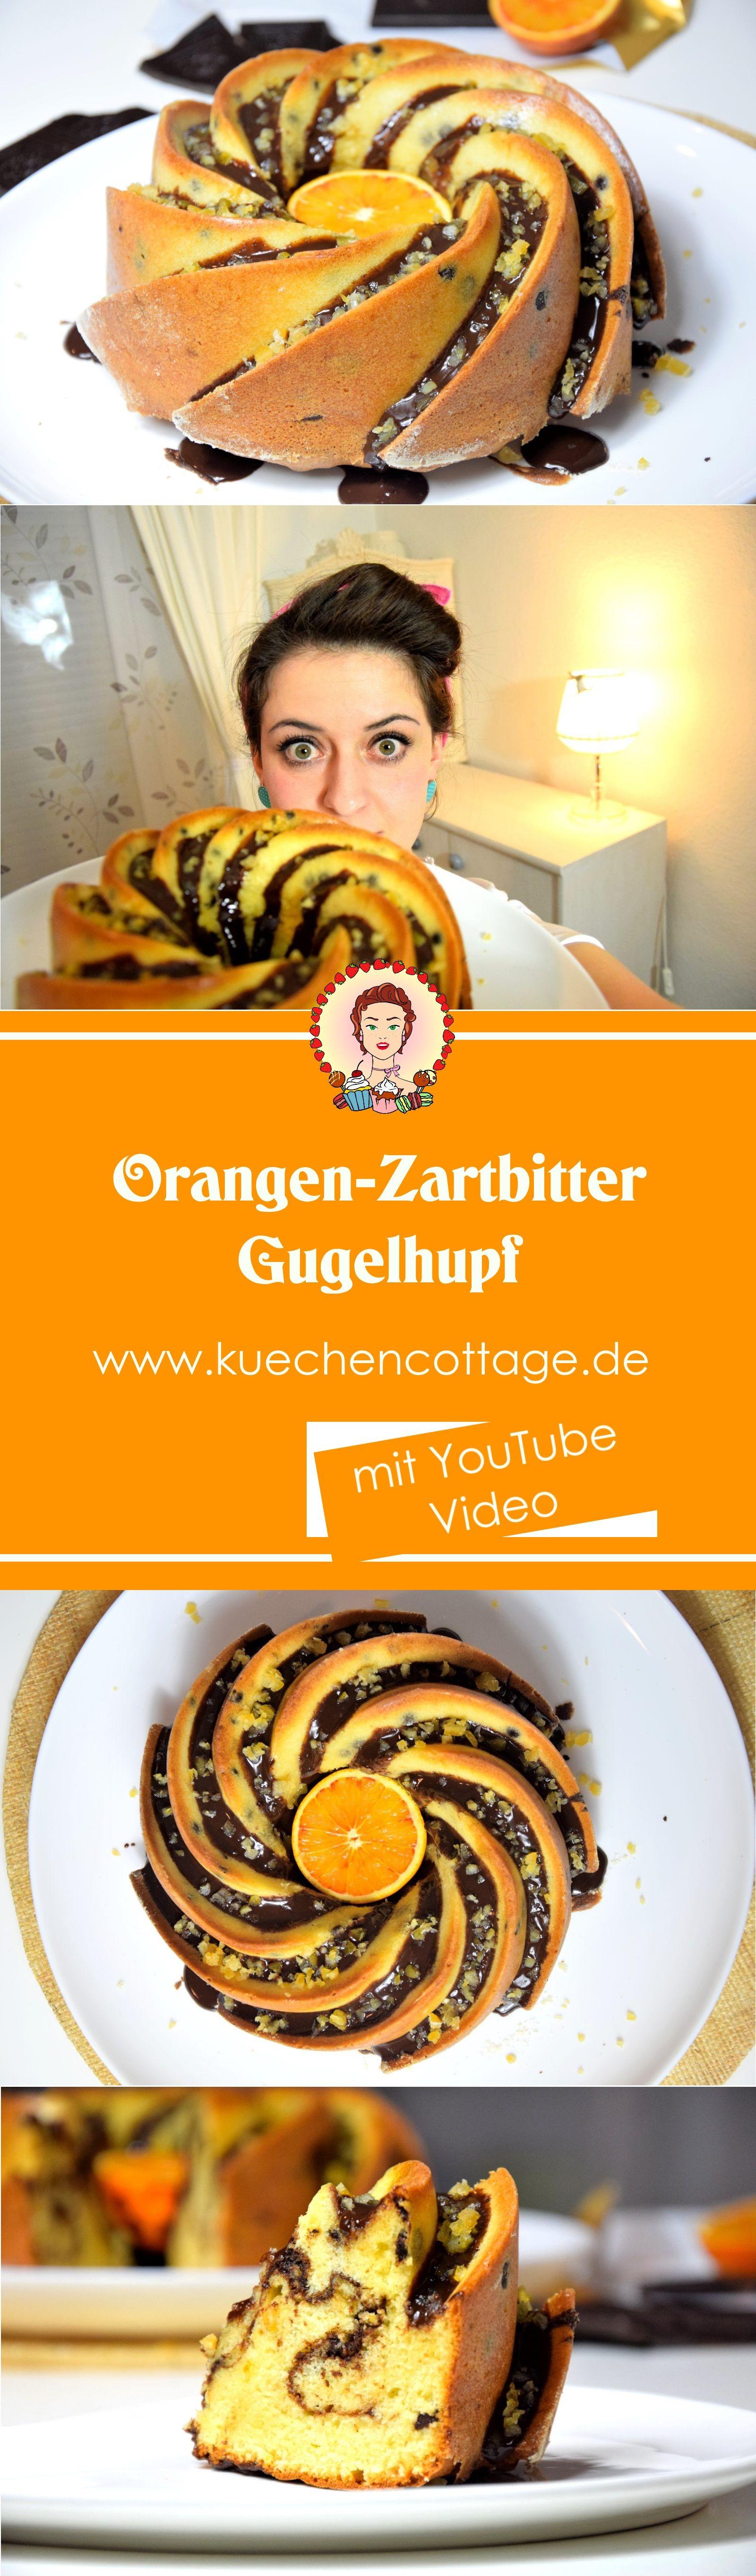 Orangen Zartbitter Gugelhupf Rezepte Lebensmittel Essen Und Lecker